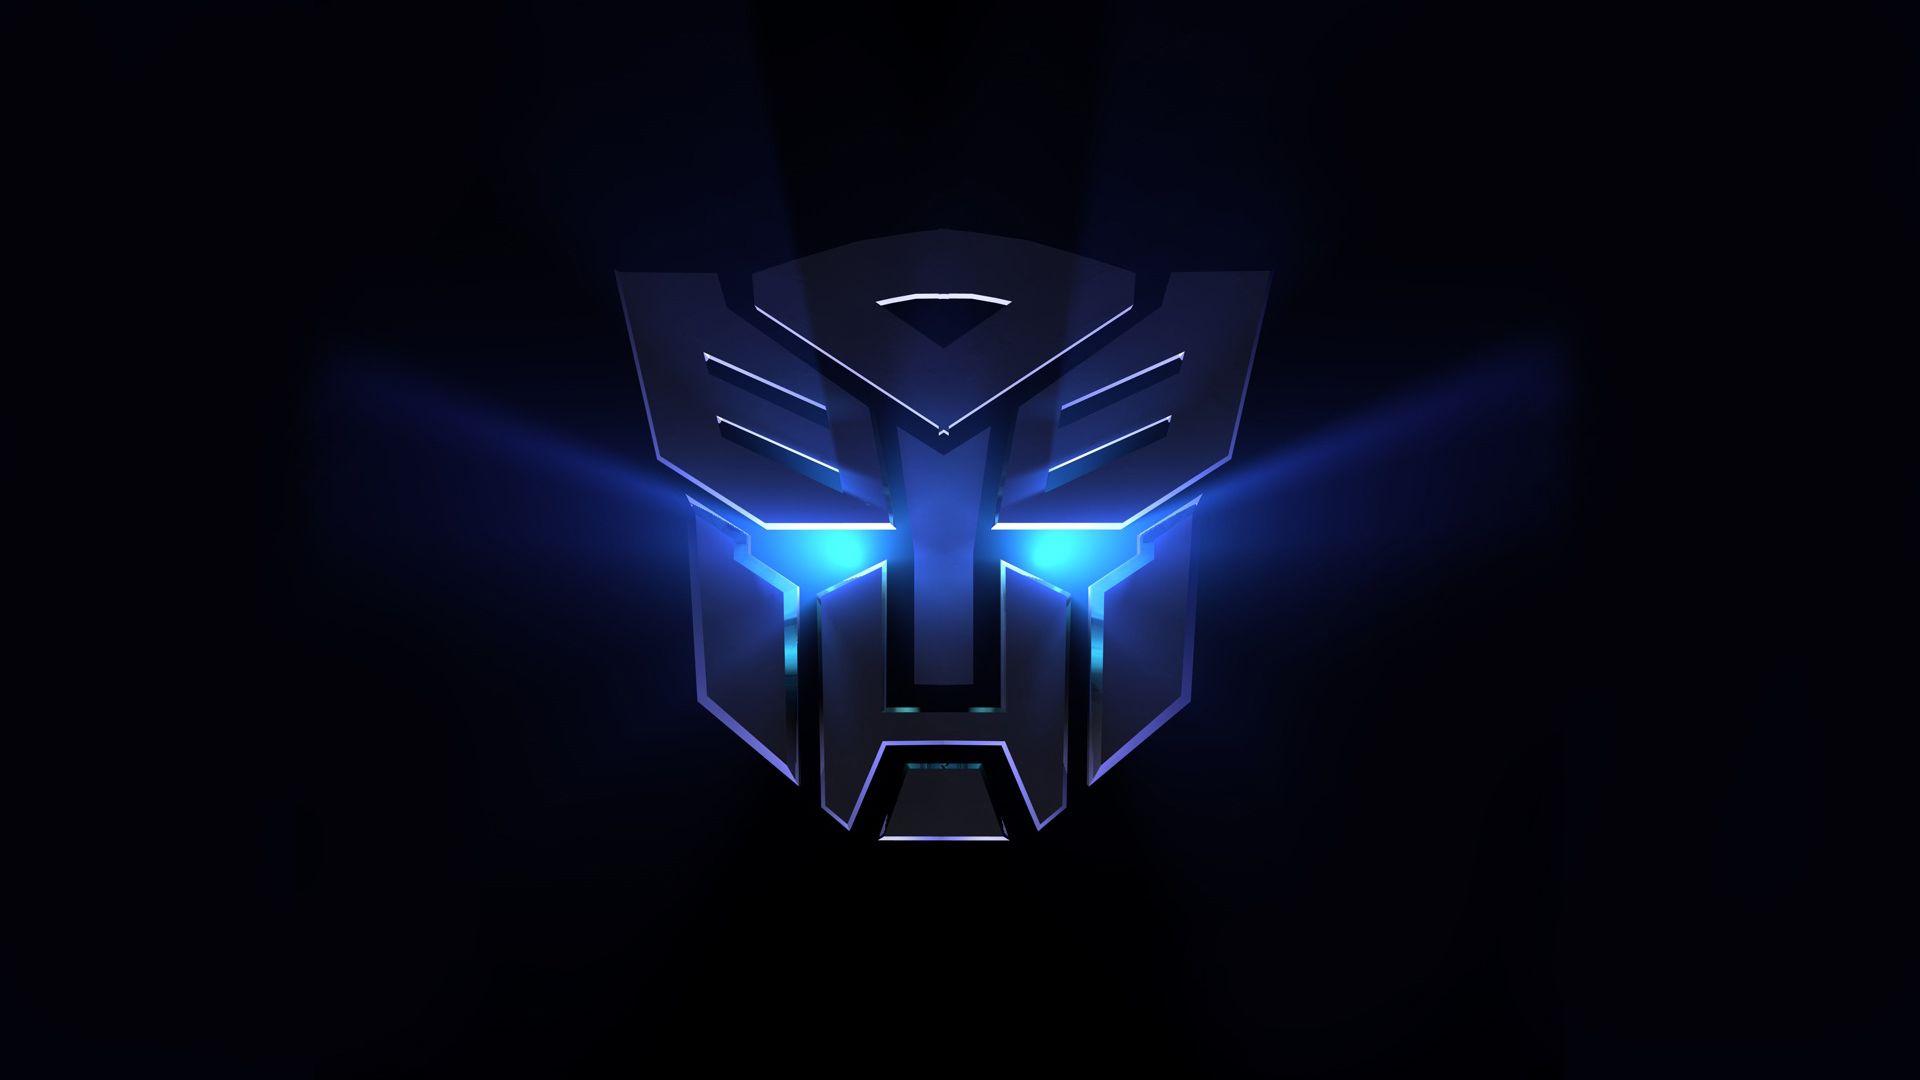 Transformers Logo Wallpapers   Top Transformers Logo 1920x1080